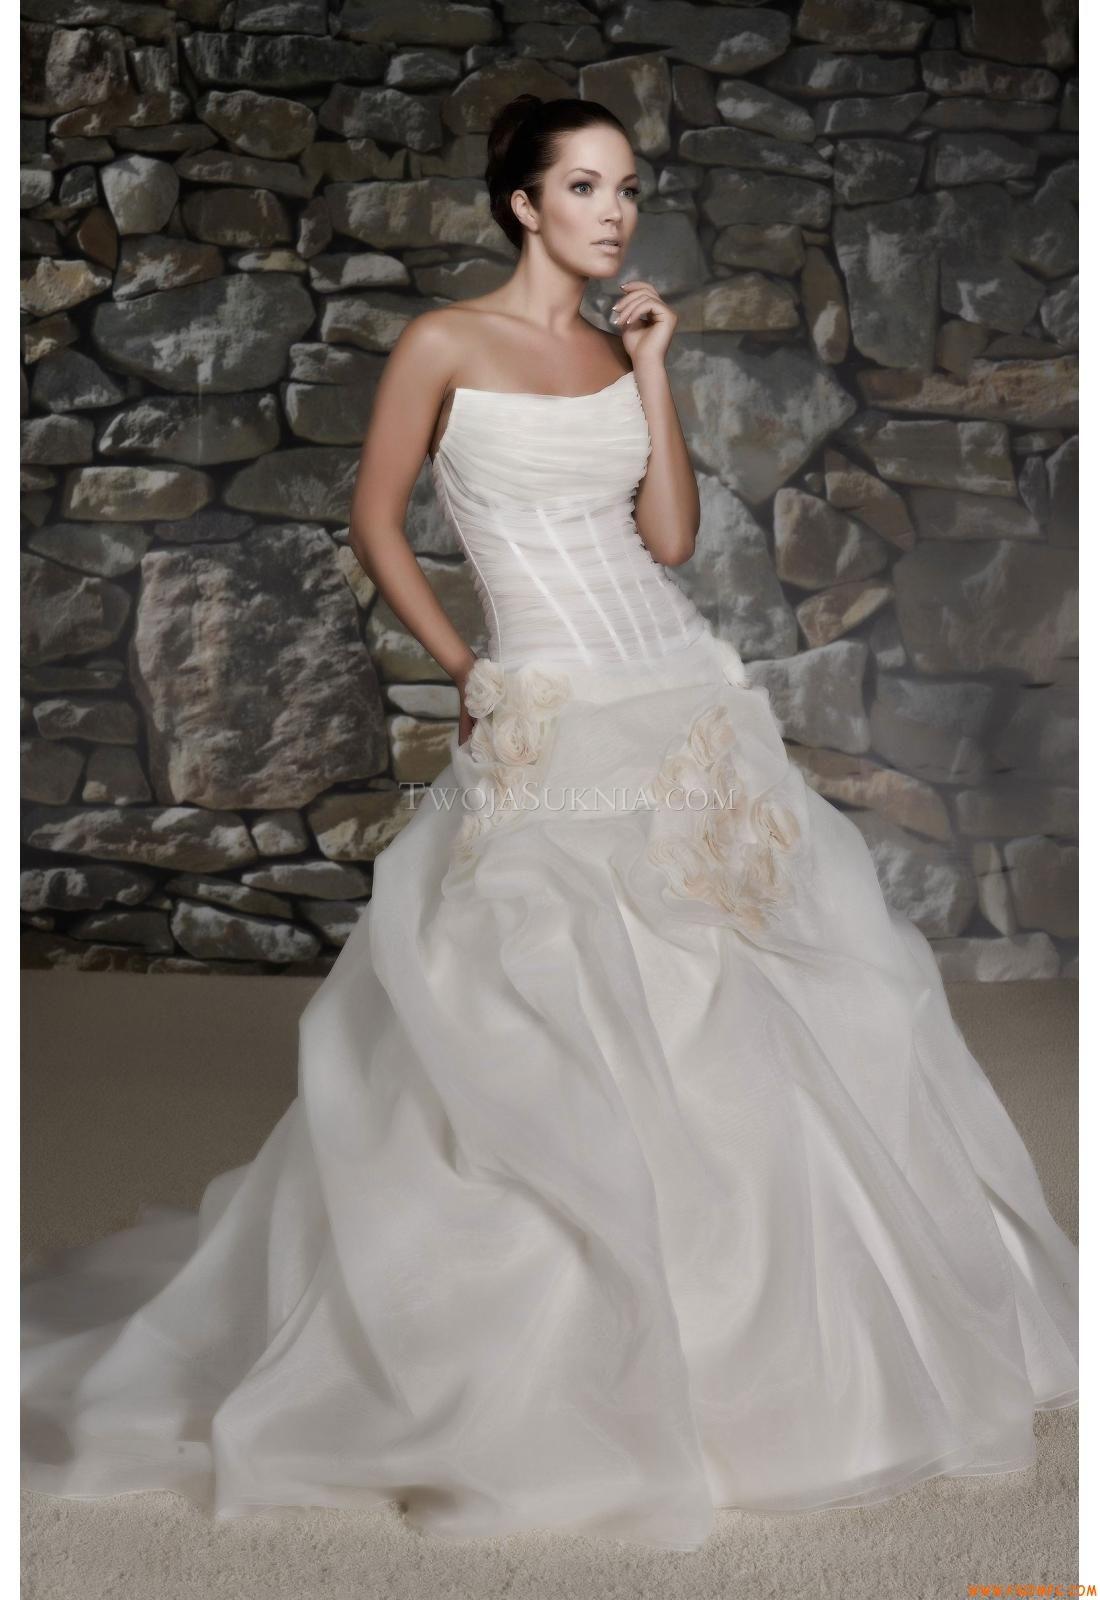 Vestidos de noiva Lisa Donetti 70153 2012